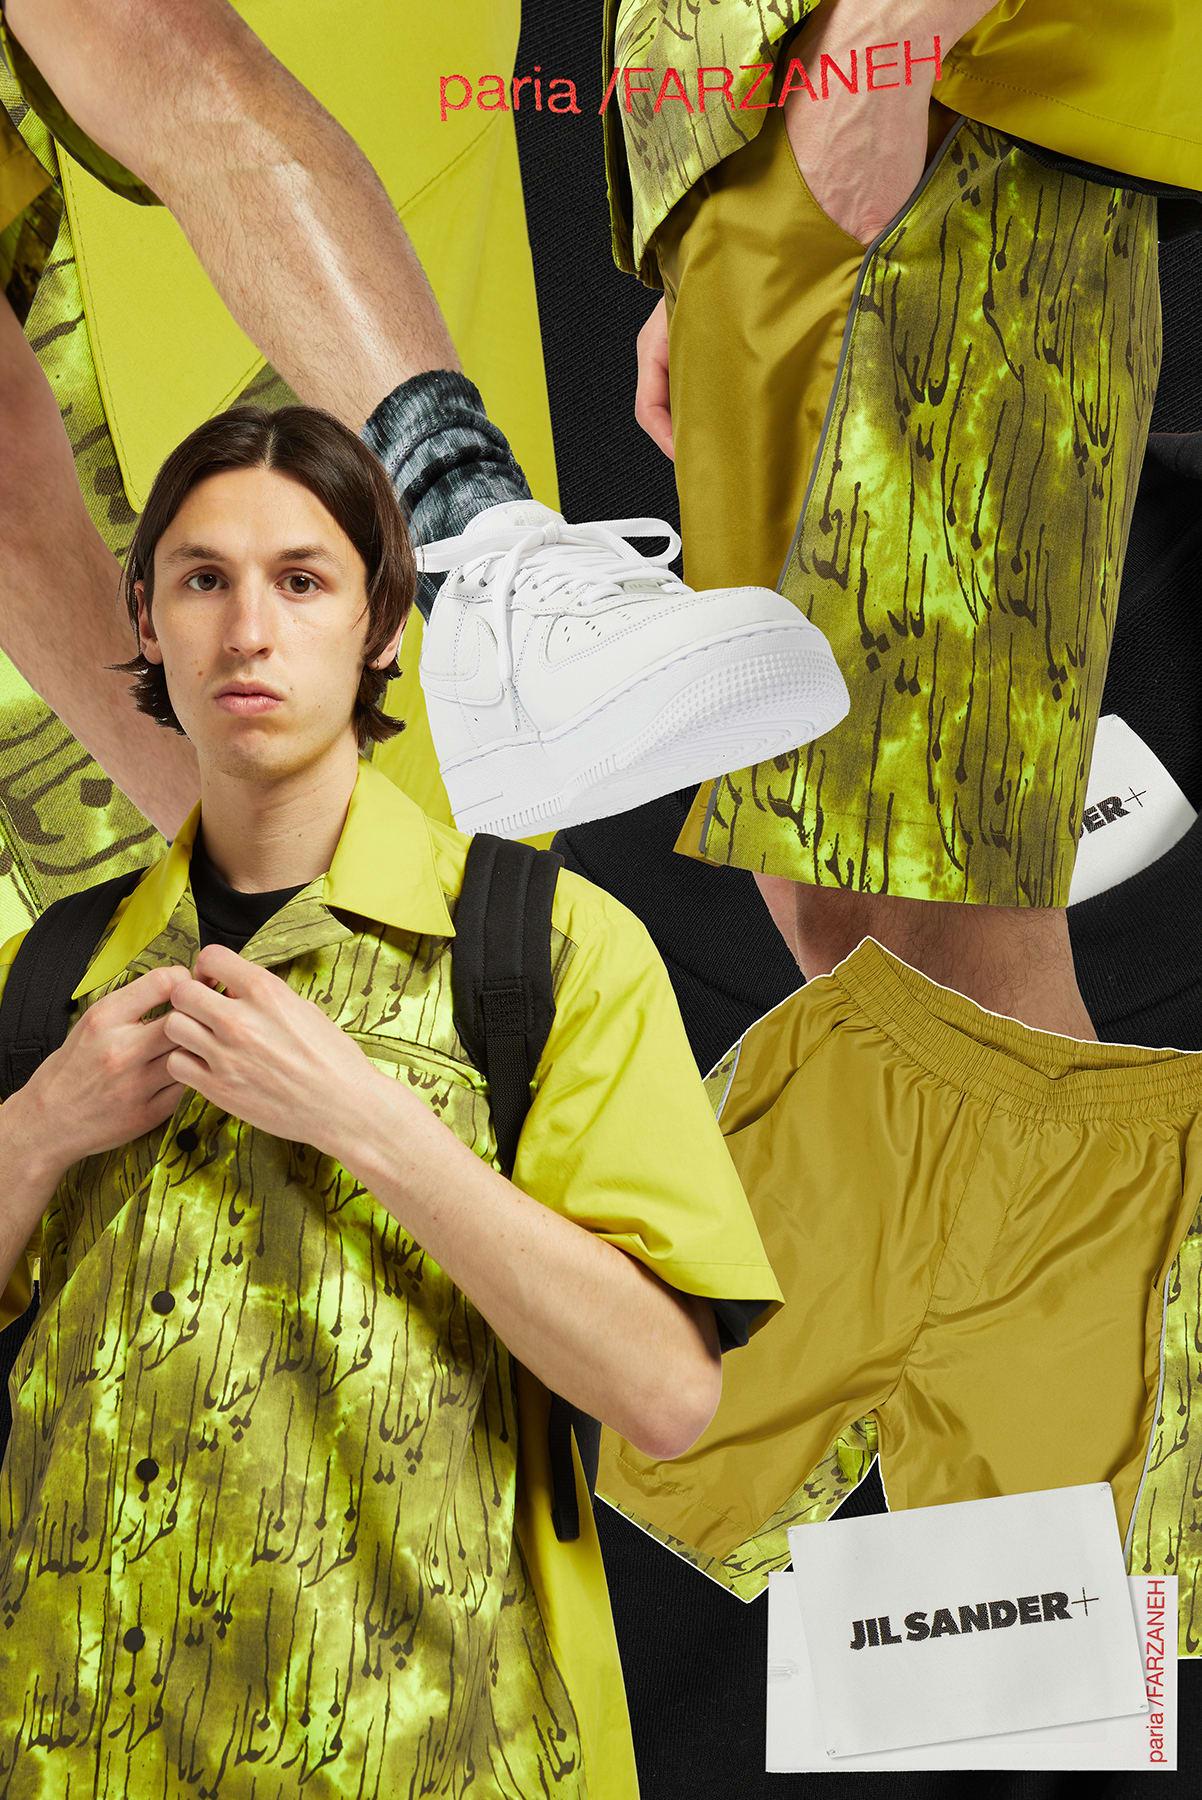 Curated 008 | Short-Stock - Model wears Paria Farzaneh Print Shorts